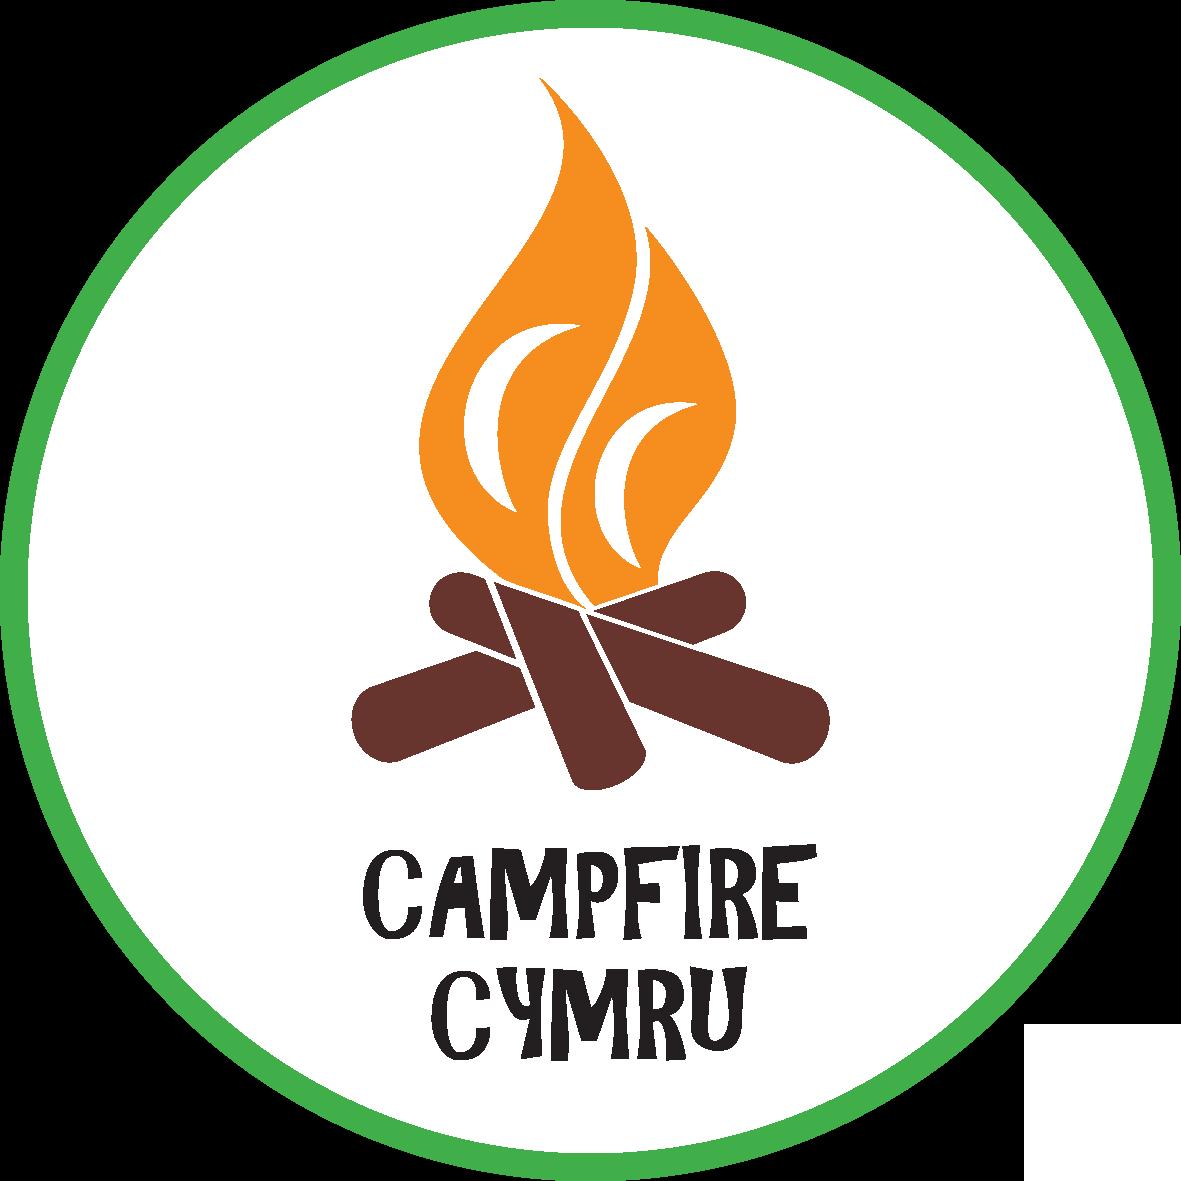 Campfire Cymru